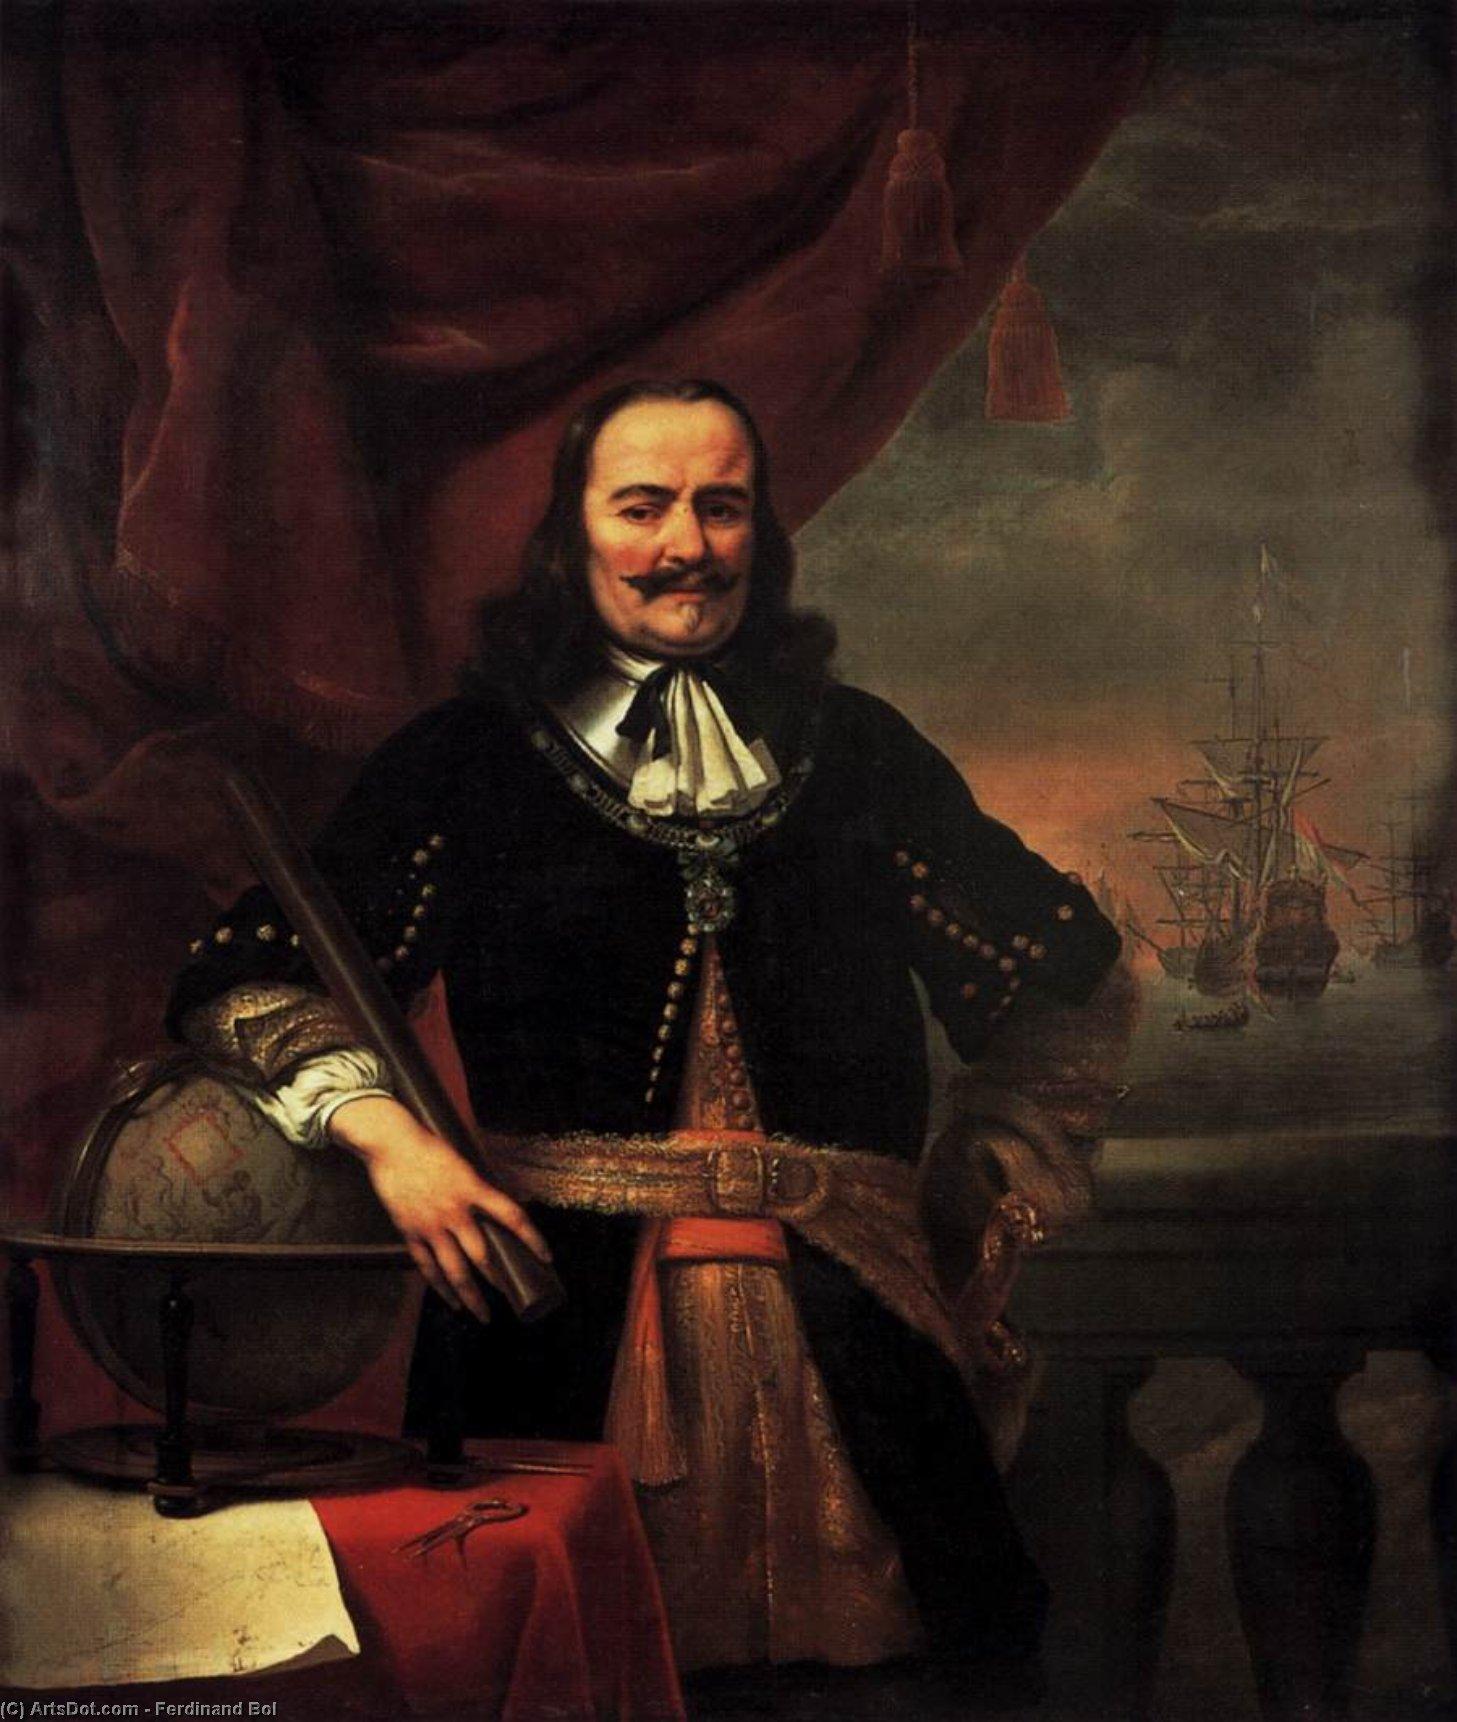 Wikioo.org - The Encyclopedia of Fine Arts - Painting, Artwork by Ferdinand Bol - Portrait of Michiel Adriaansz de Ruyter